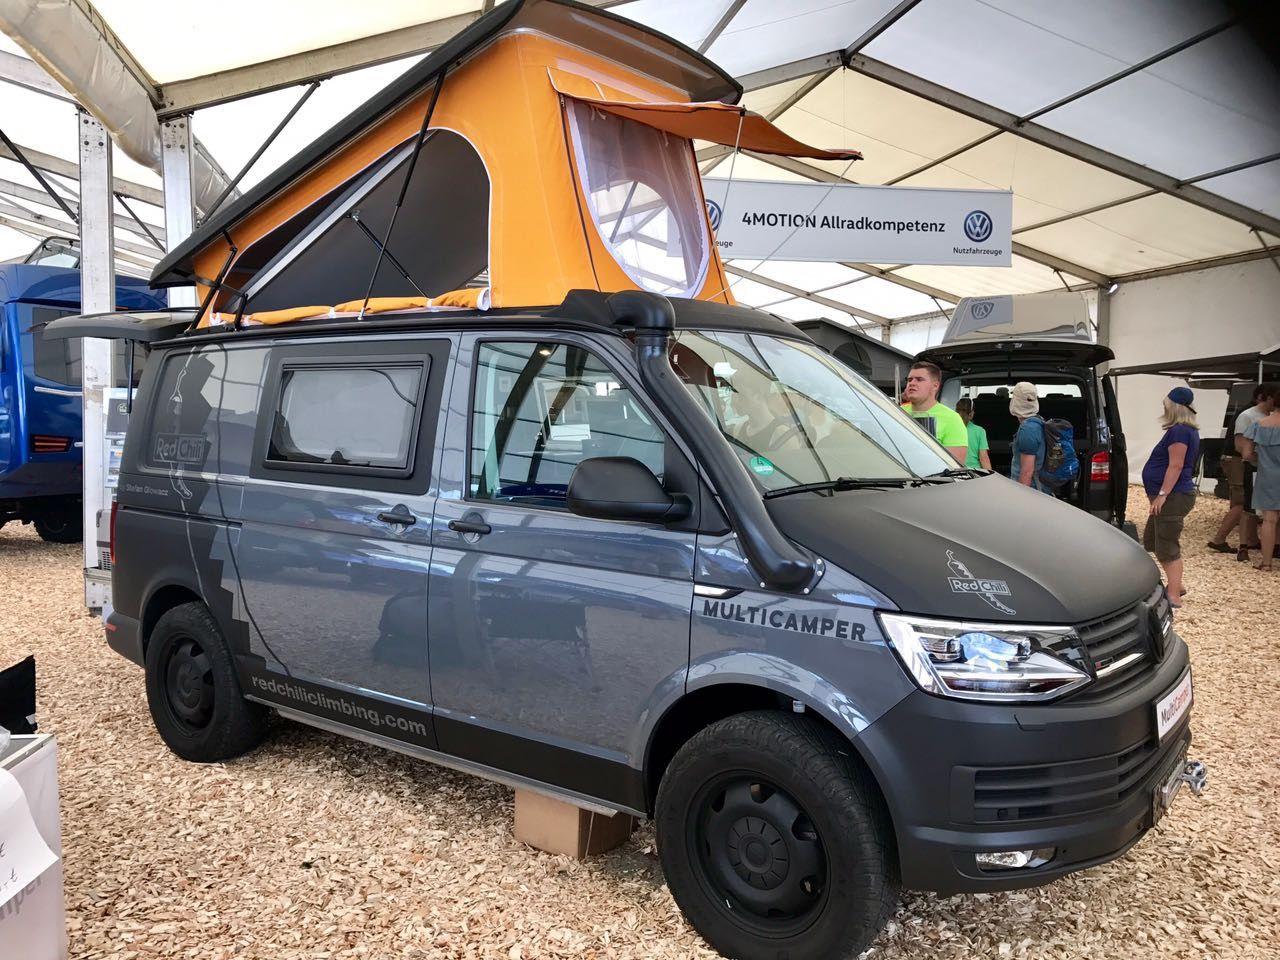 Pin Von Koni Shock Absorbers Auf Vw Bus Offroad Vw Campingbus Mini Wohnmobil Vw T4 Multivan